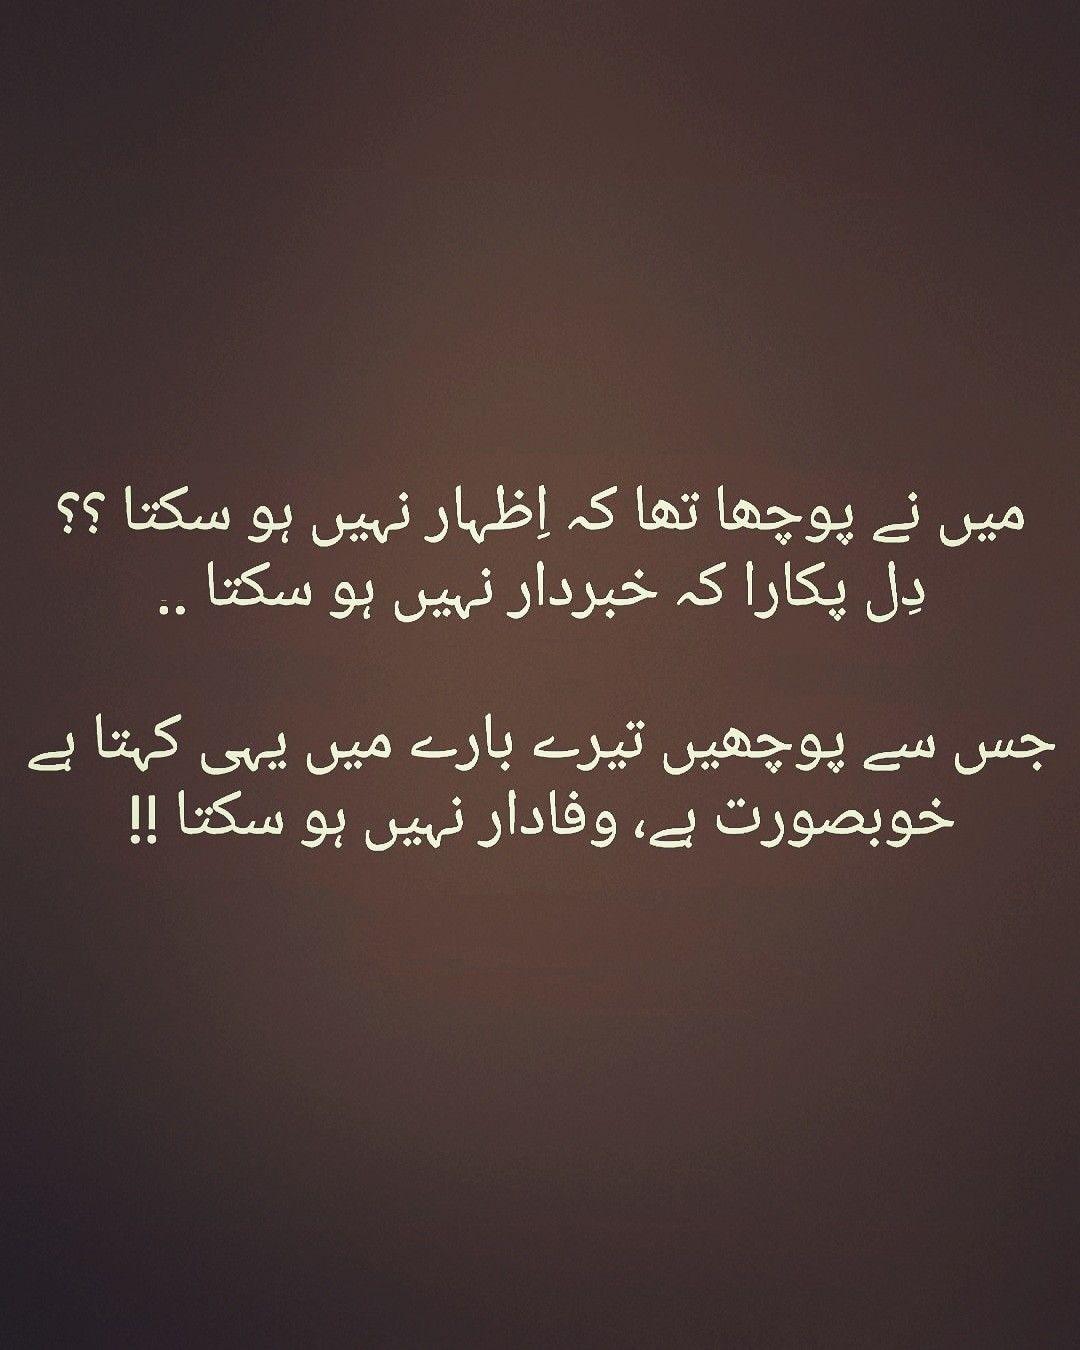 Wo khubsurat he, wafadari nahi ho sakta